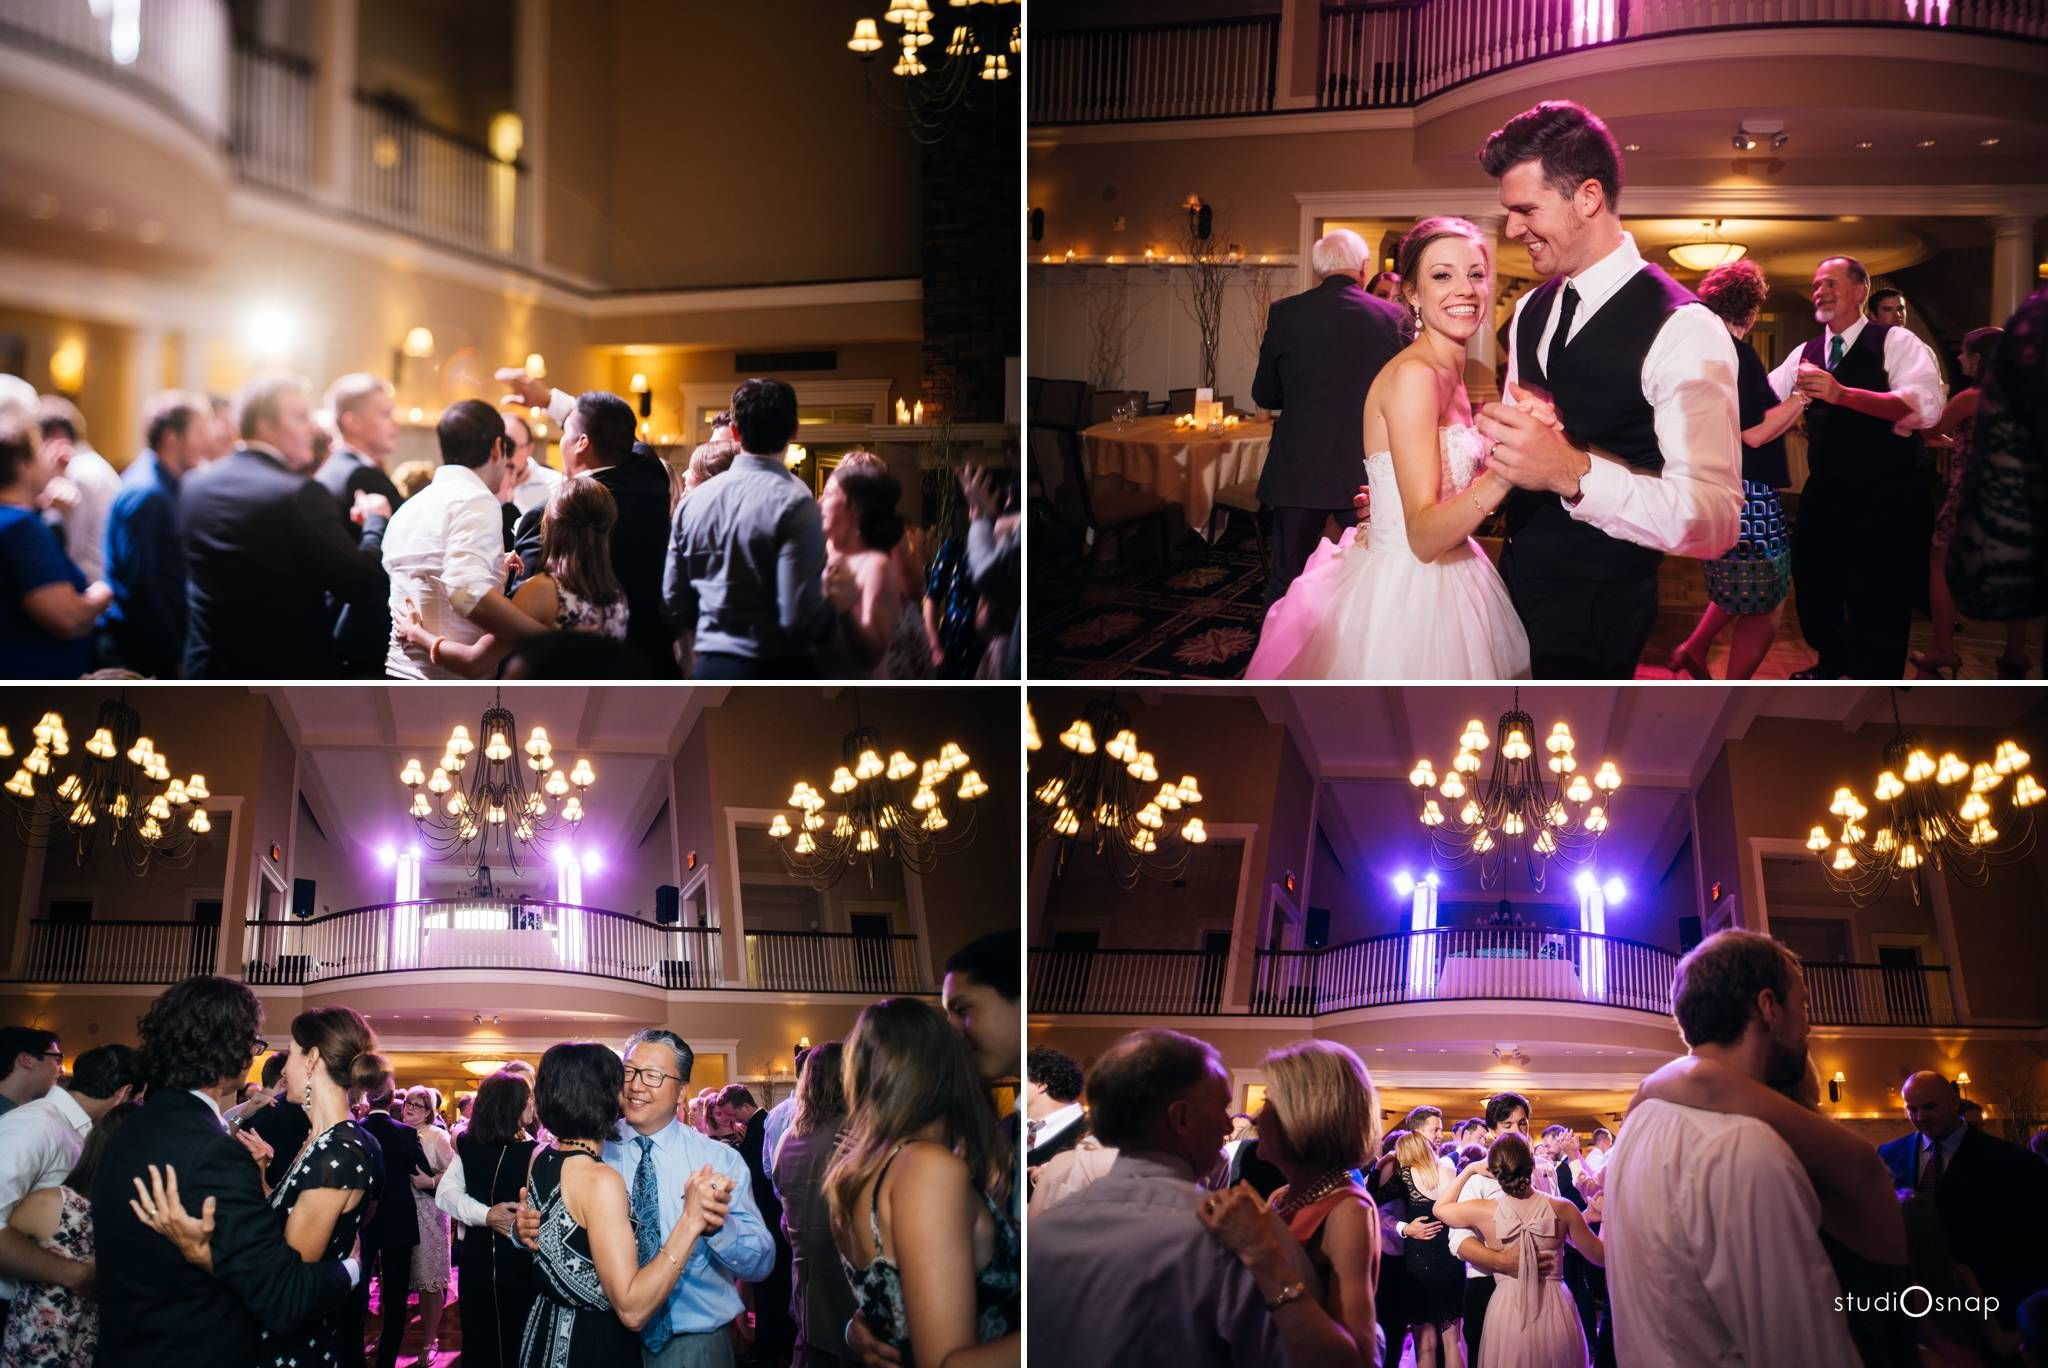 Dance floor oakhurst country club wedding studiosnap photography